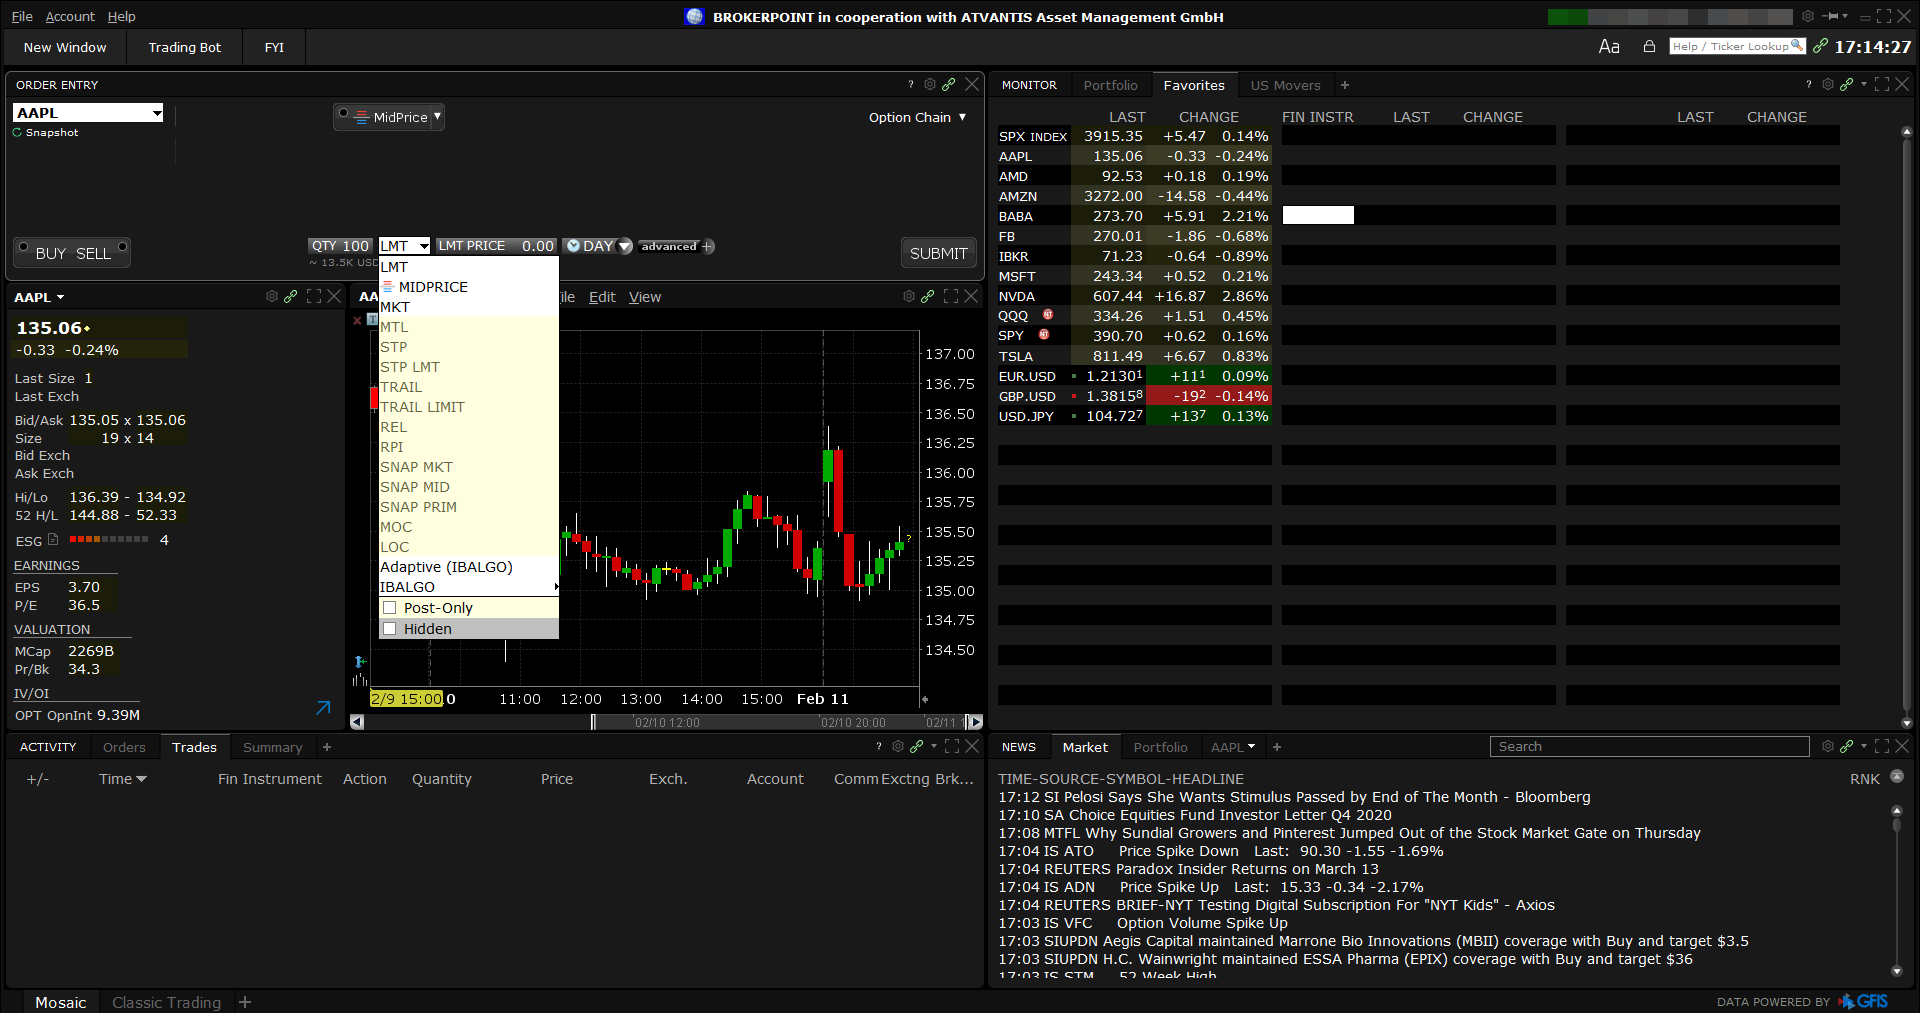 Brokerpoint review - Desktop trading platform - Order panel